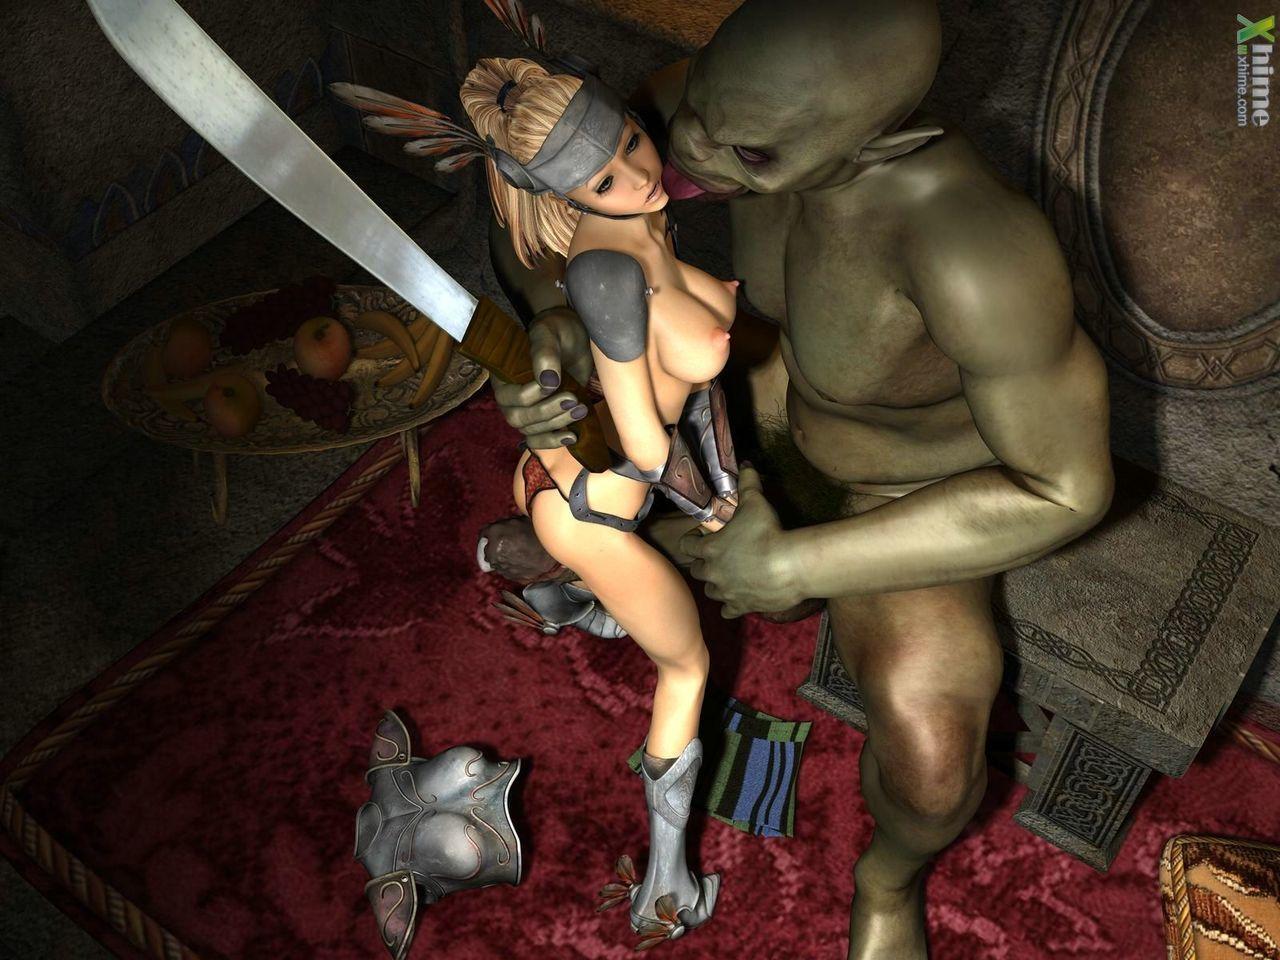 fantasy cg collection - part 5